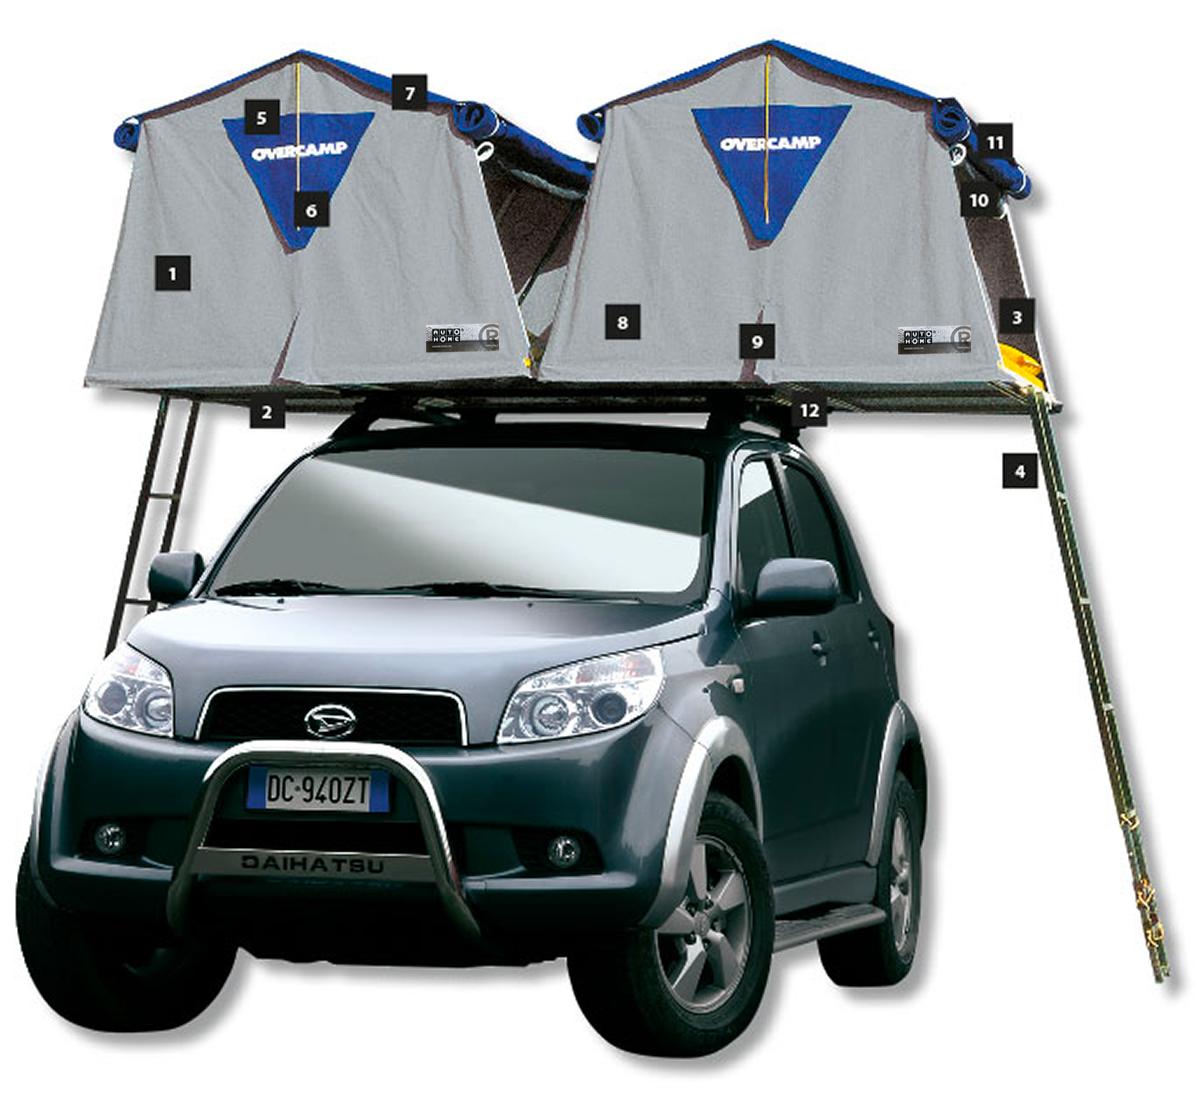 The Overcamp Roof Top Tent Roof Top Tent Top Tents Tent